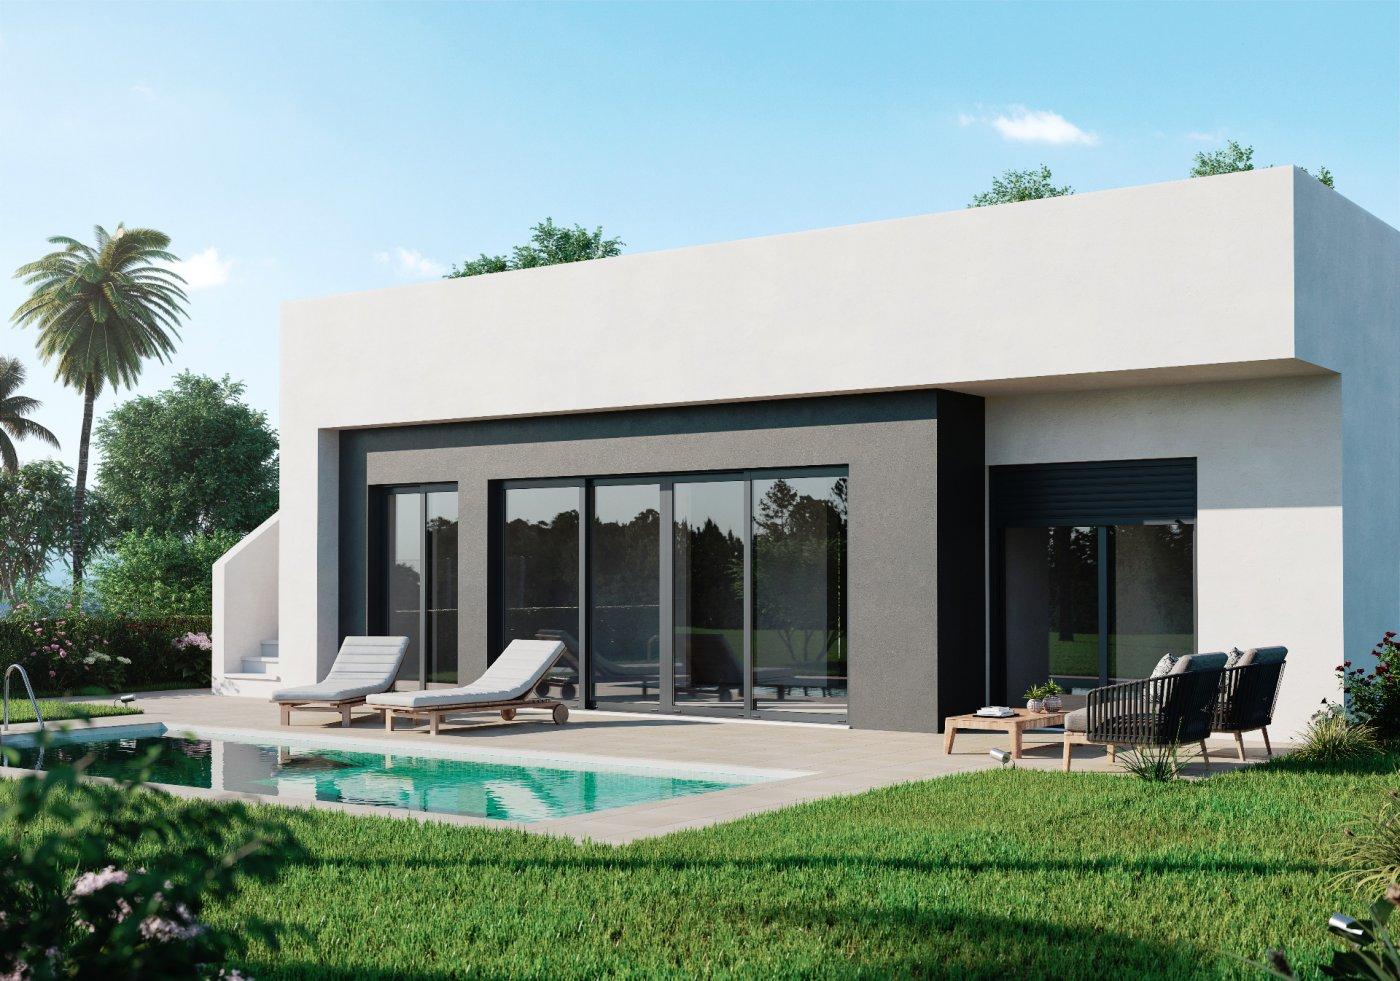 Villa - For Sale - Alhama de Murcia - Condado de Alhama